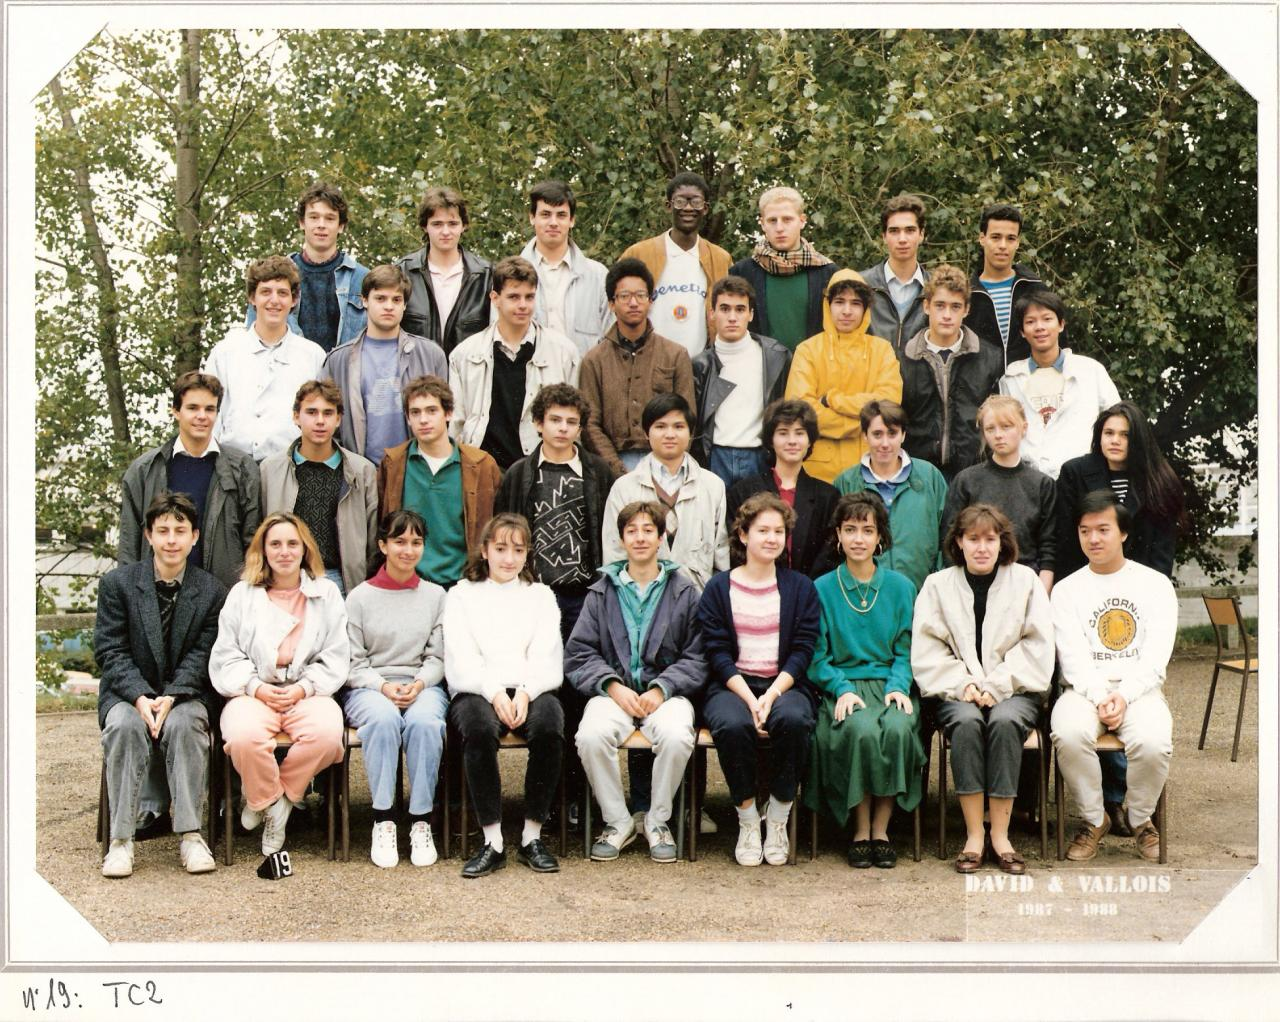 1988 - TC2